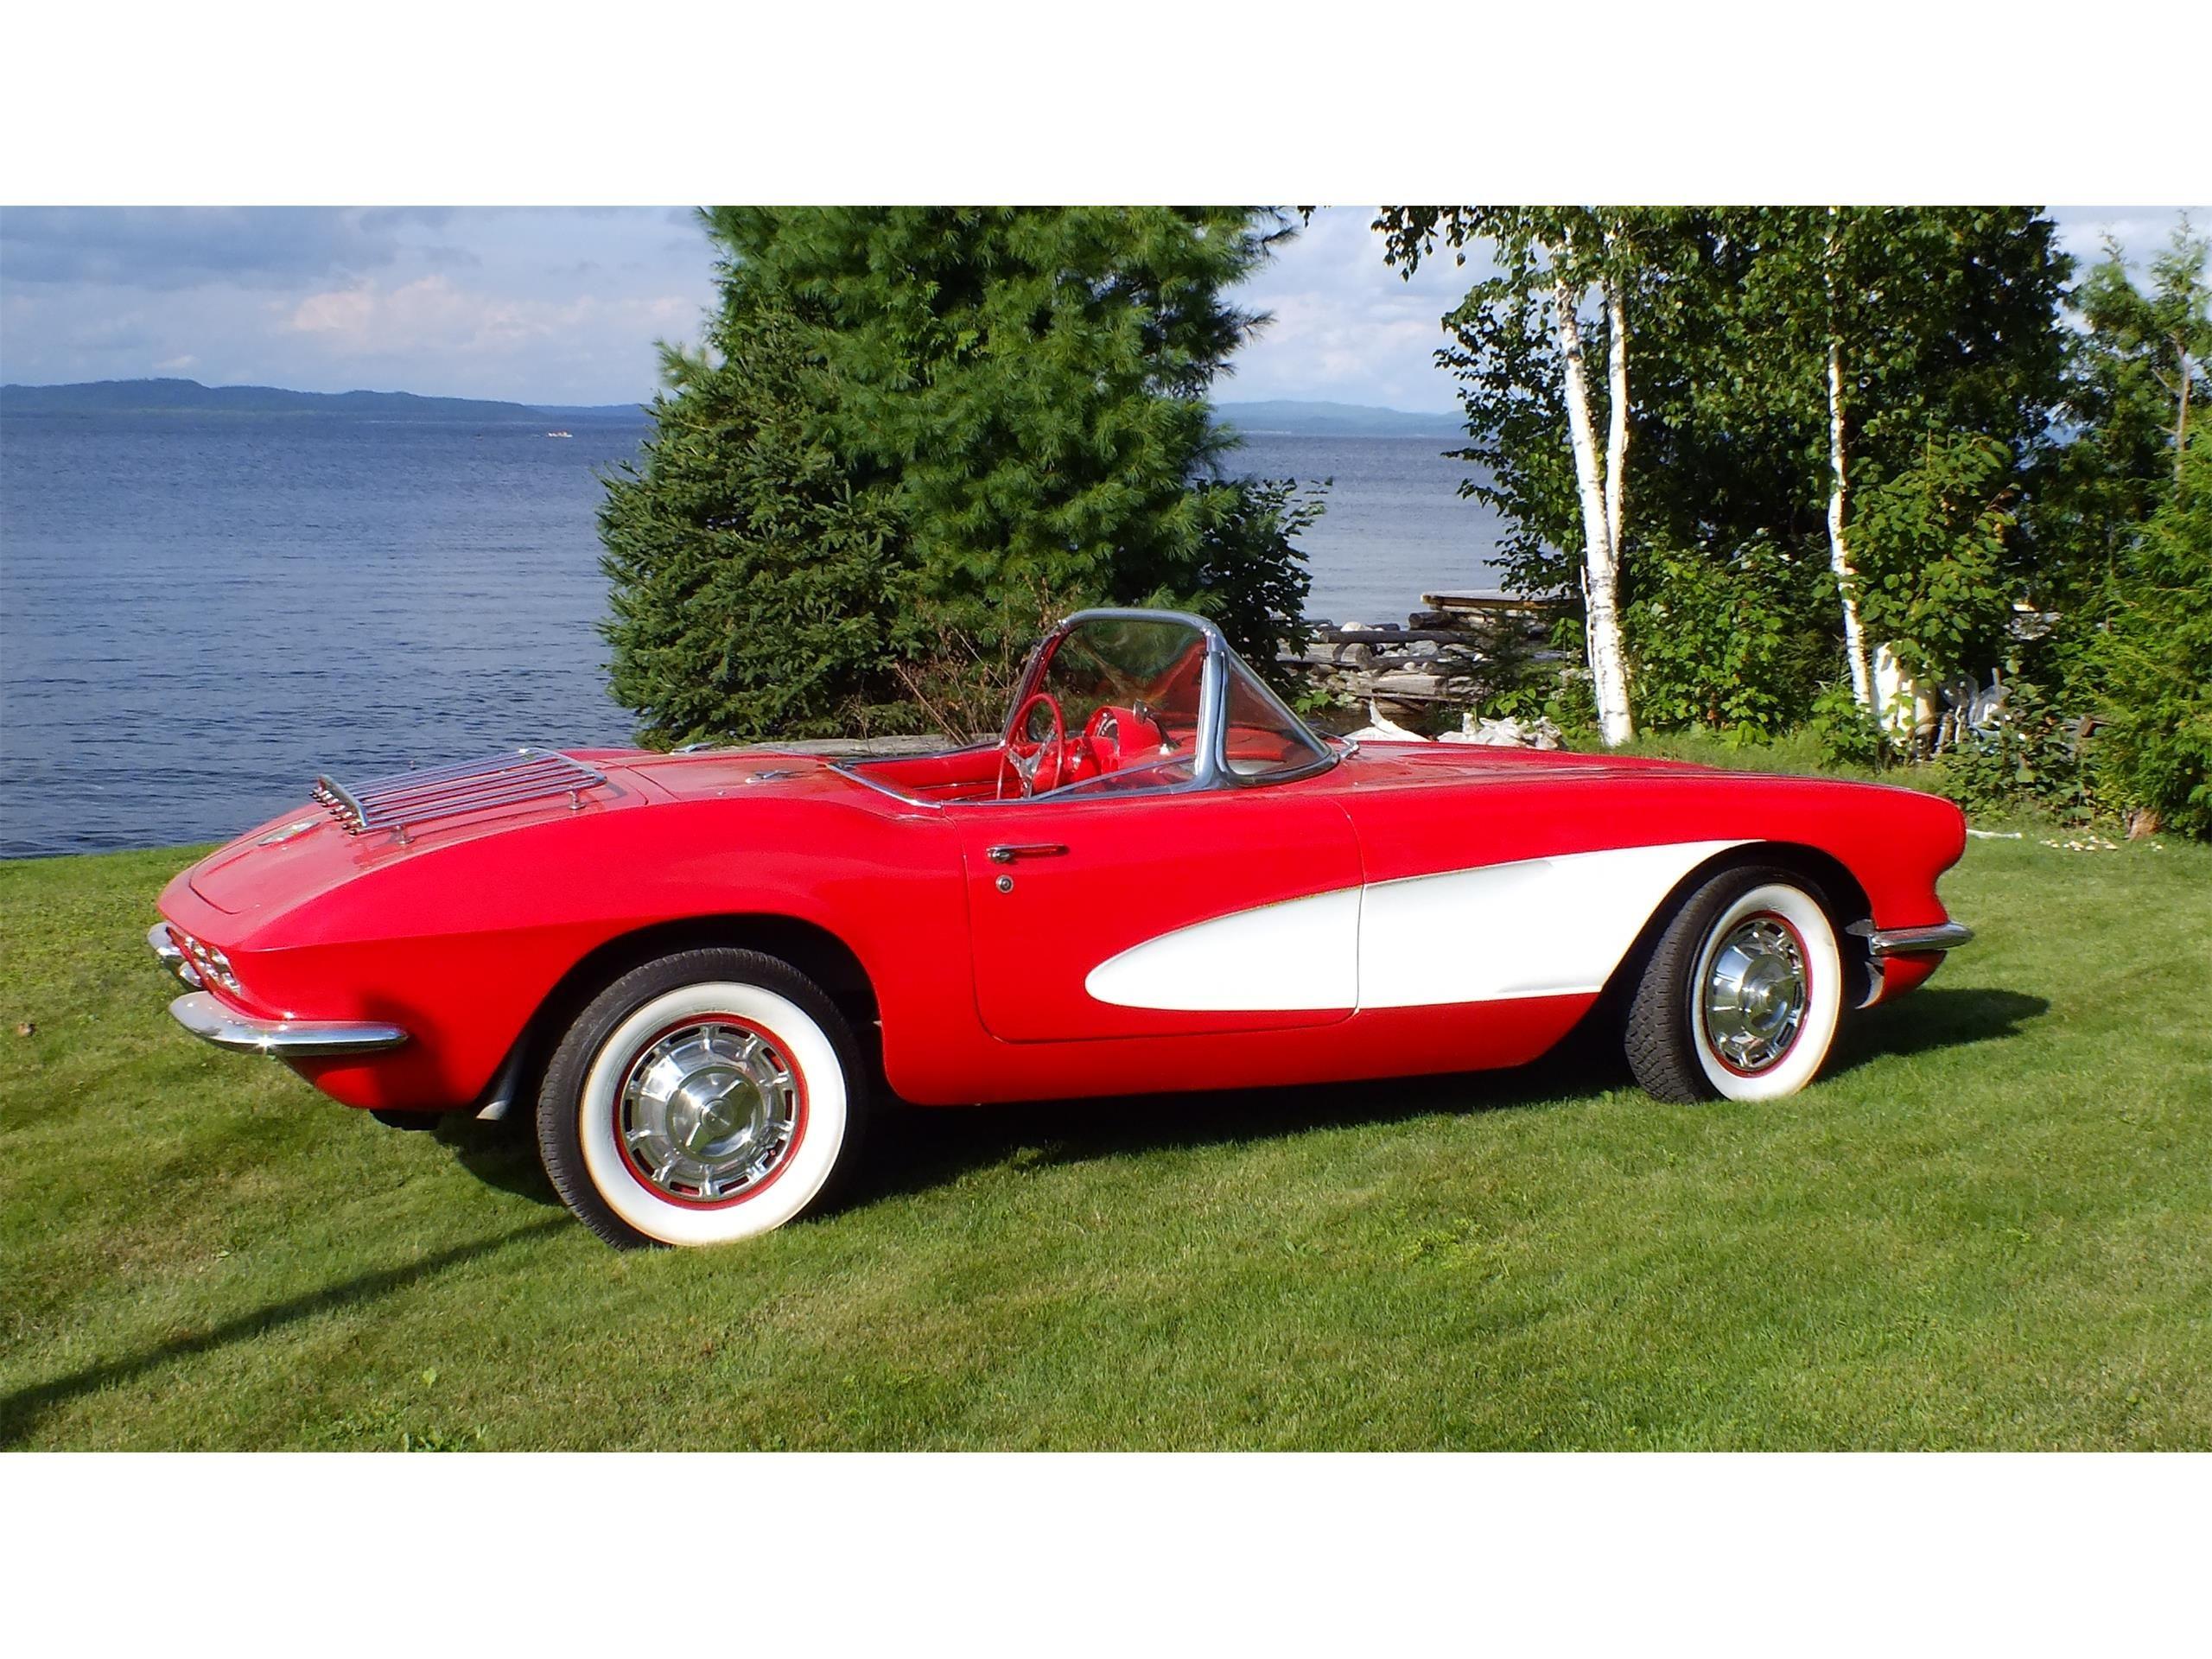 1962 Chevrolet Corvette For Sale Listing Id Cc 1152948 Classiccars Com Driveyourdream Corvette Chevrolet